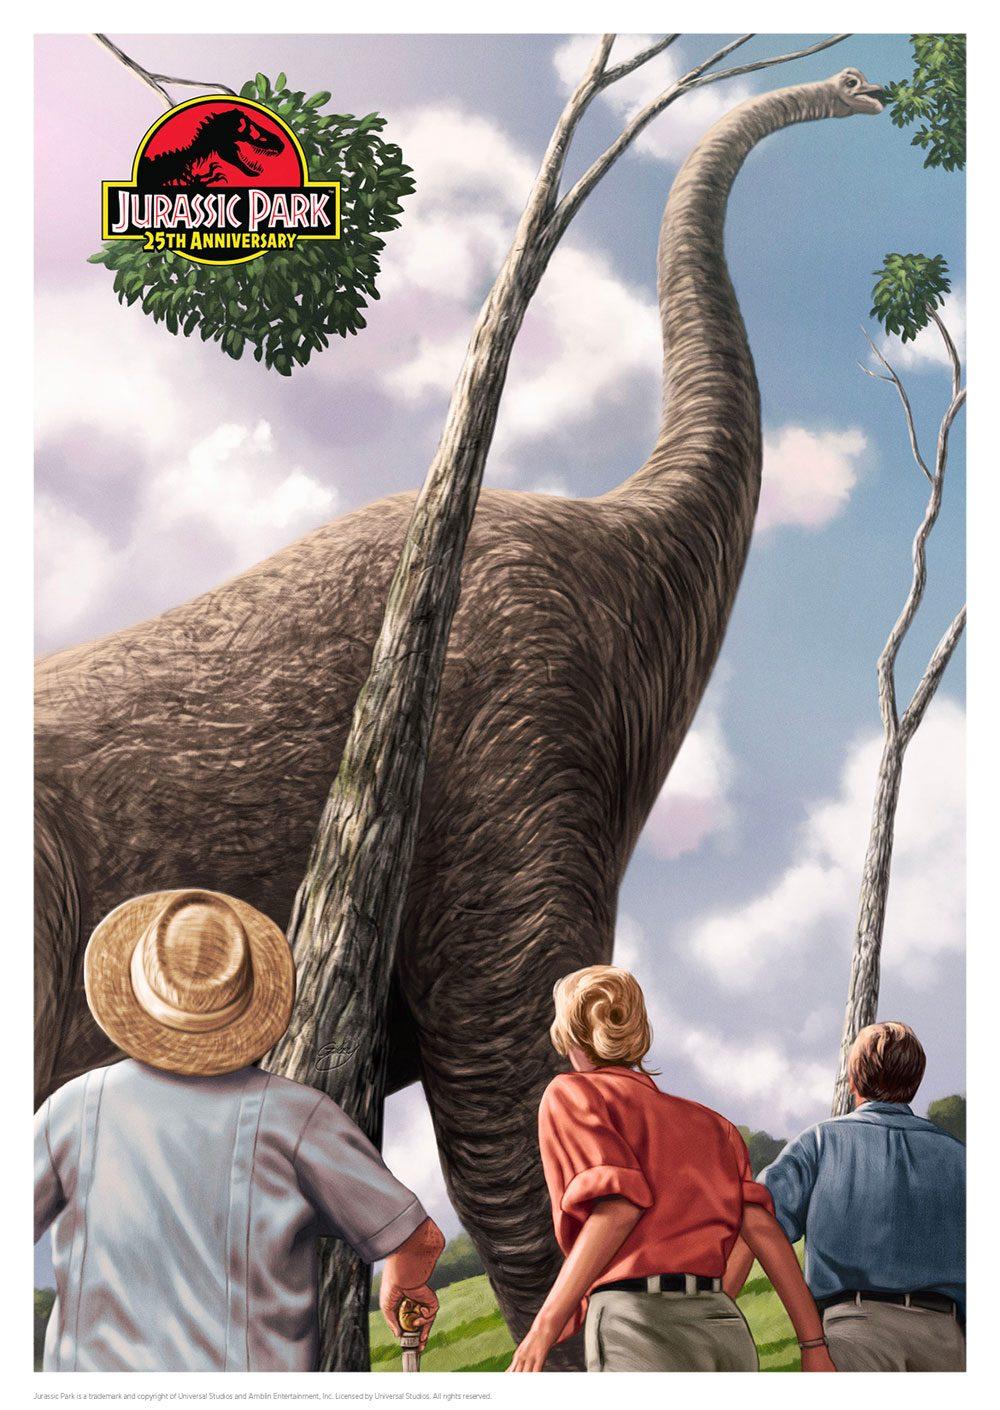 Jurassic Park Art Print 25th Anniversary 42 x 30 cm